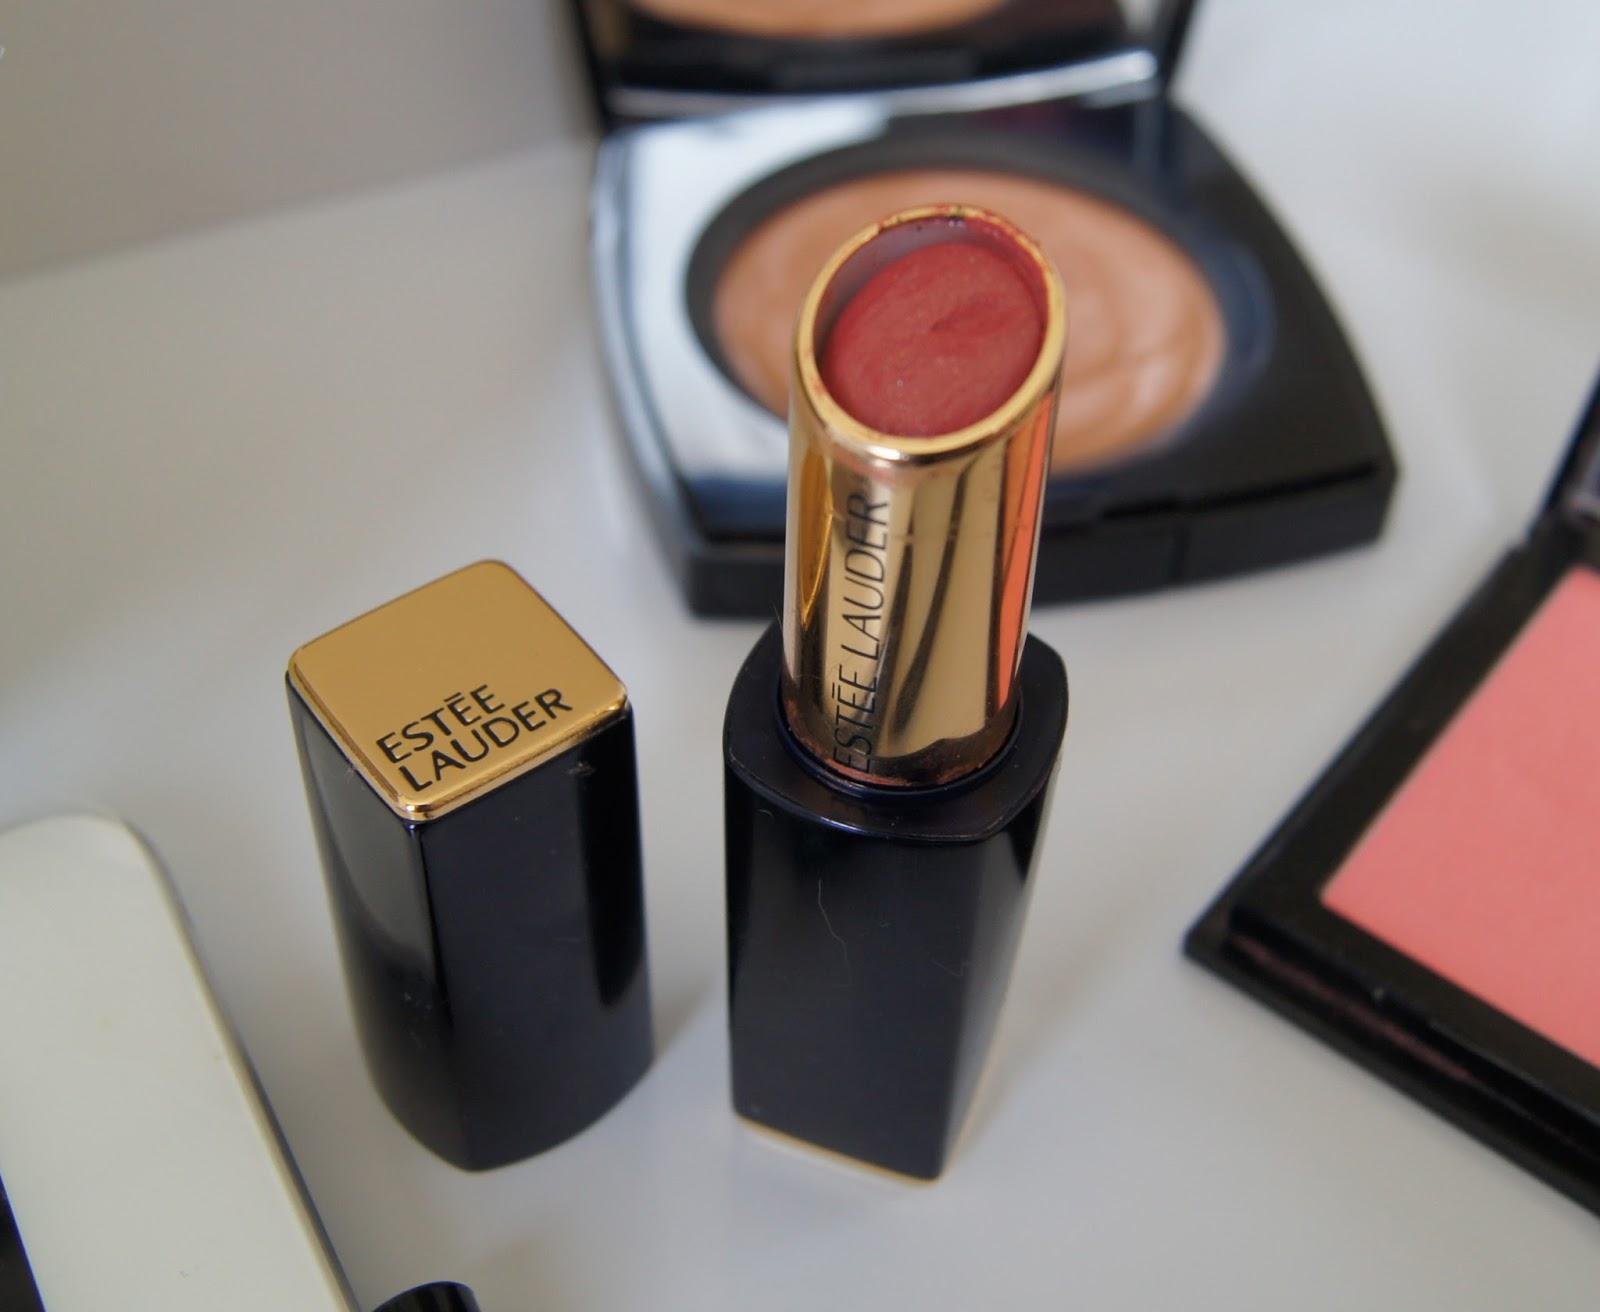 Estee Lauder Pure Color Envy lipstick in Charmed